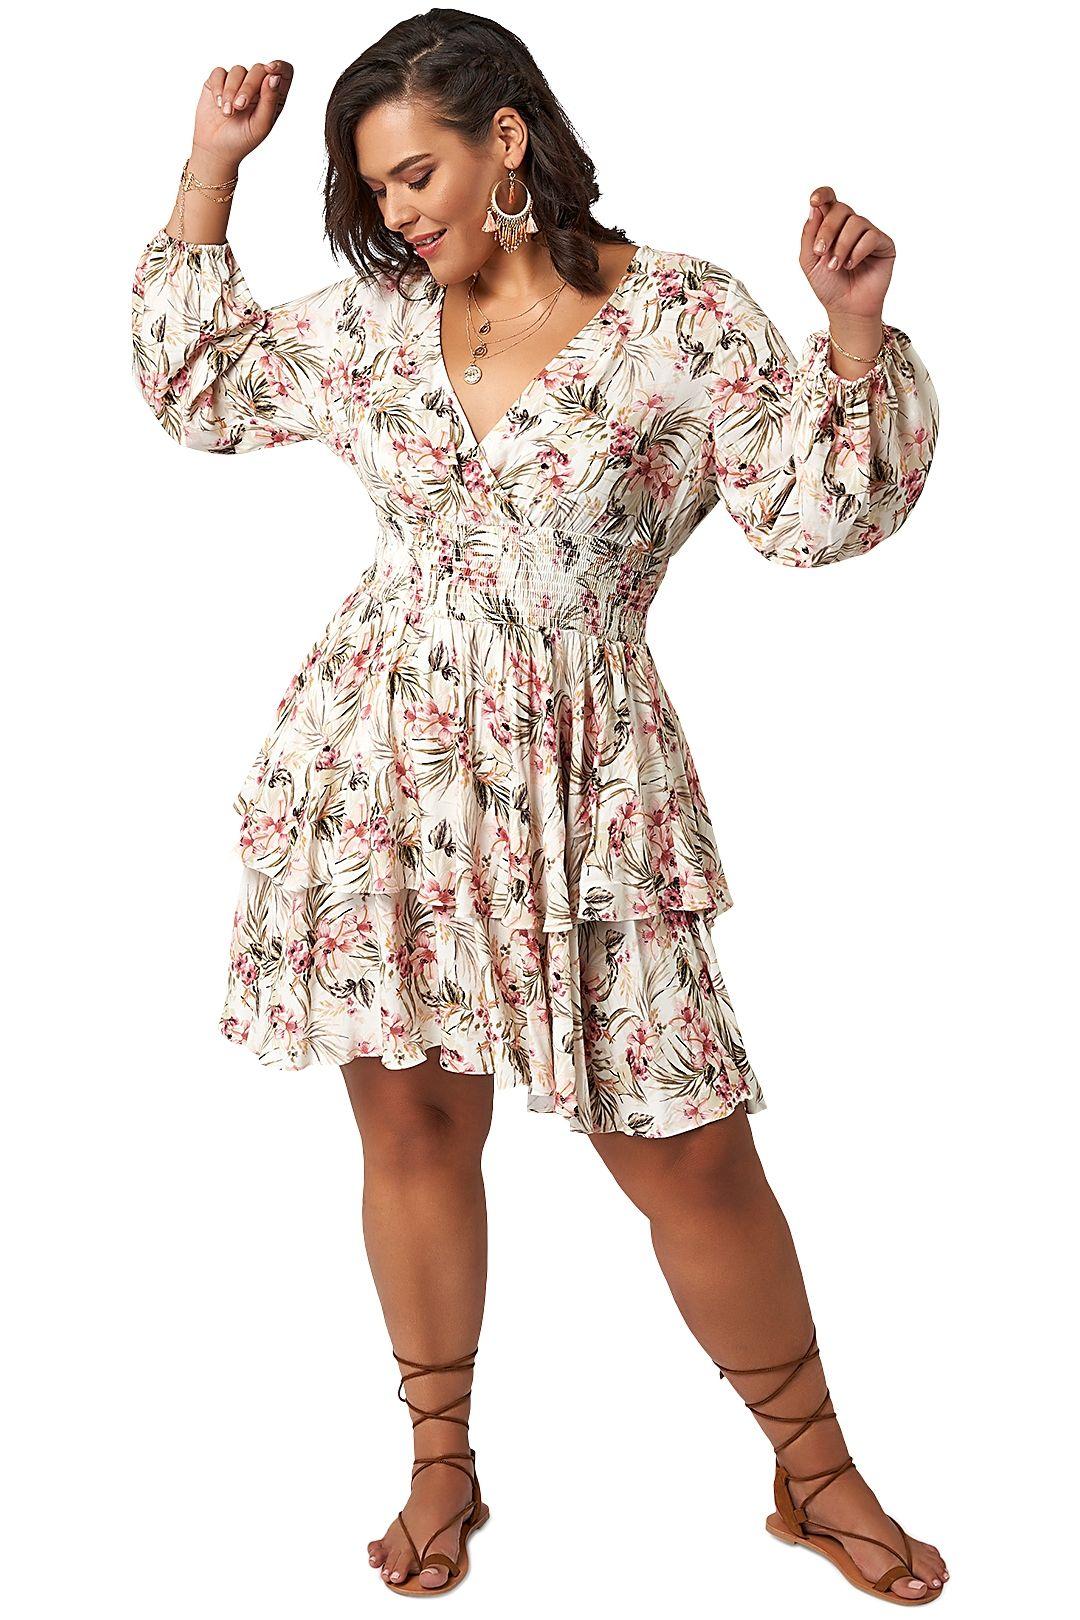 The Poetic Gypsy Sundancer Mini Dress floral